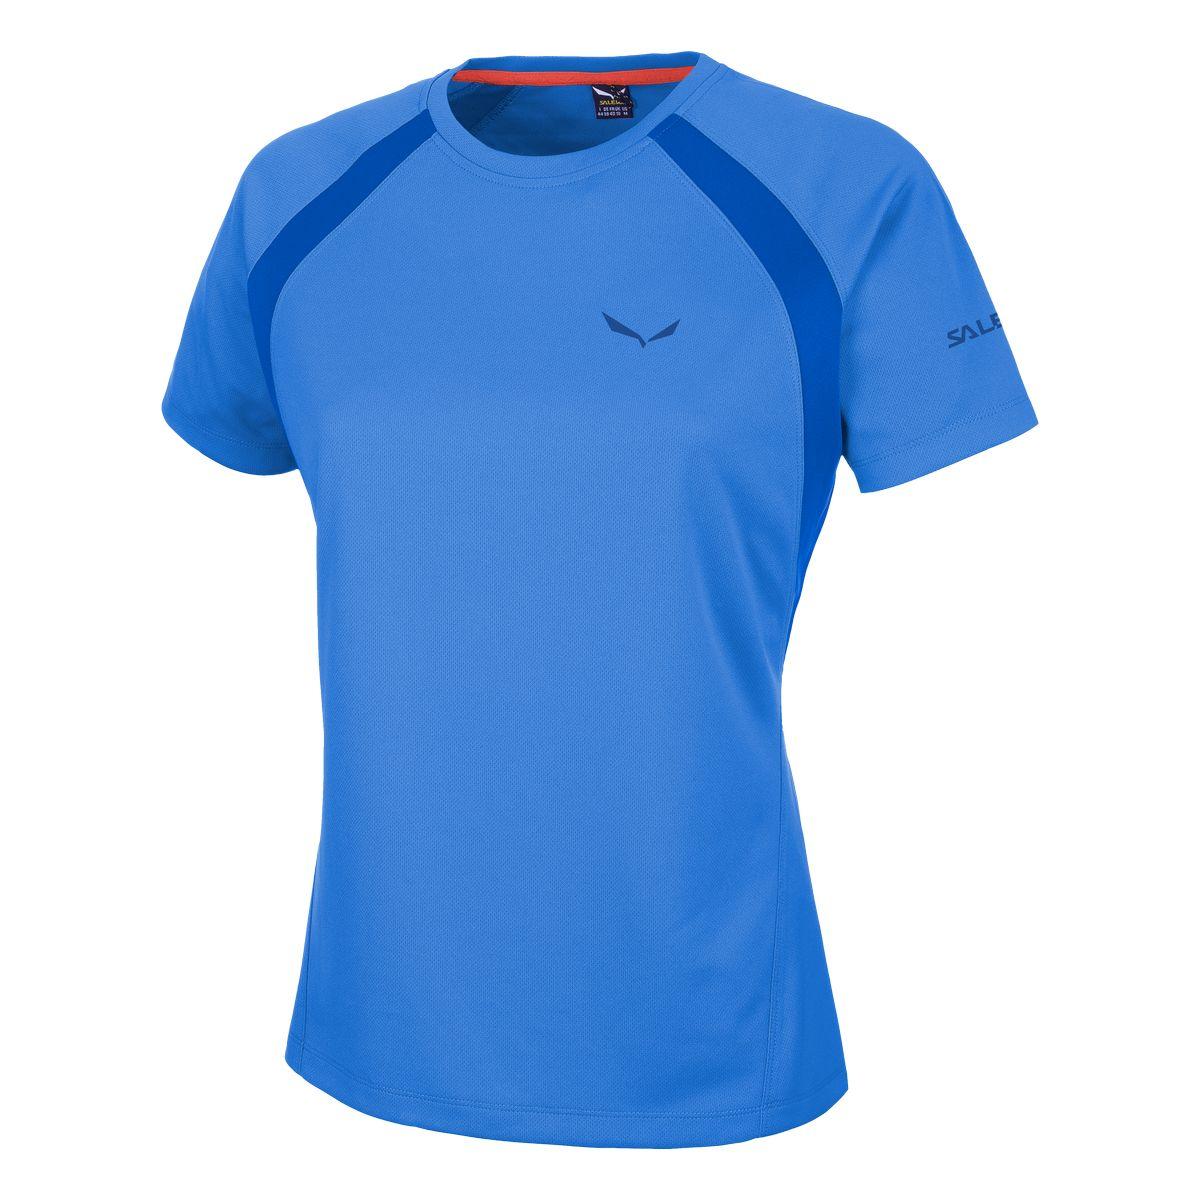 Футболка для активного отдыха Salewa 2016 PUEZ (SPORTY B) DRY W S/S TEE royal blue/8310